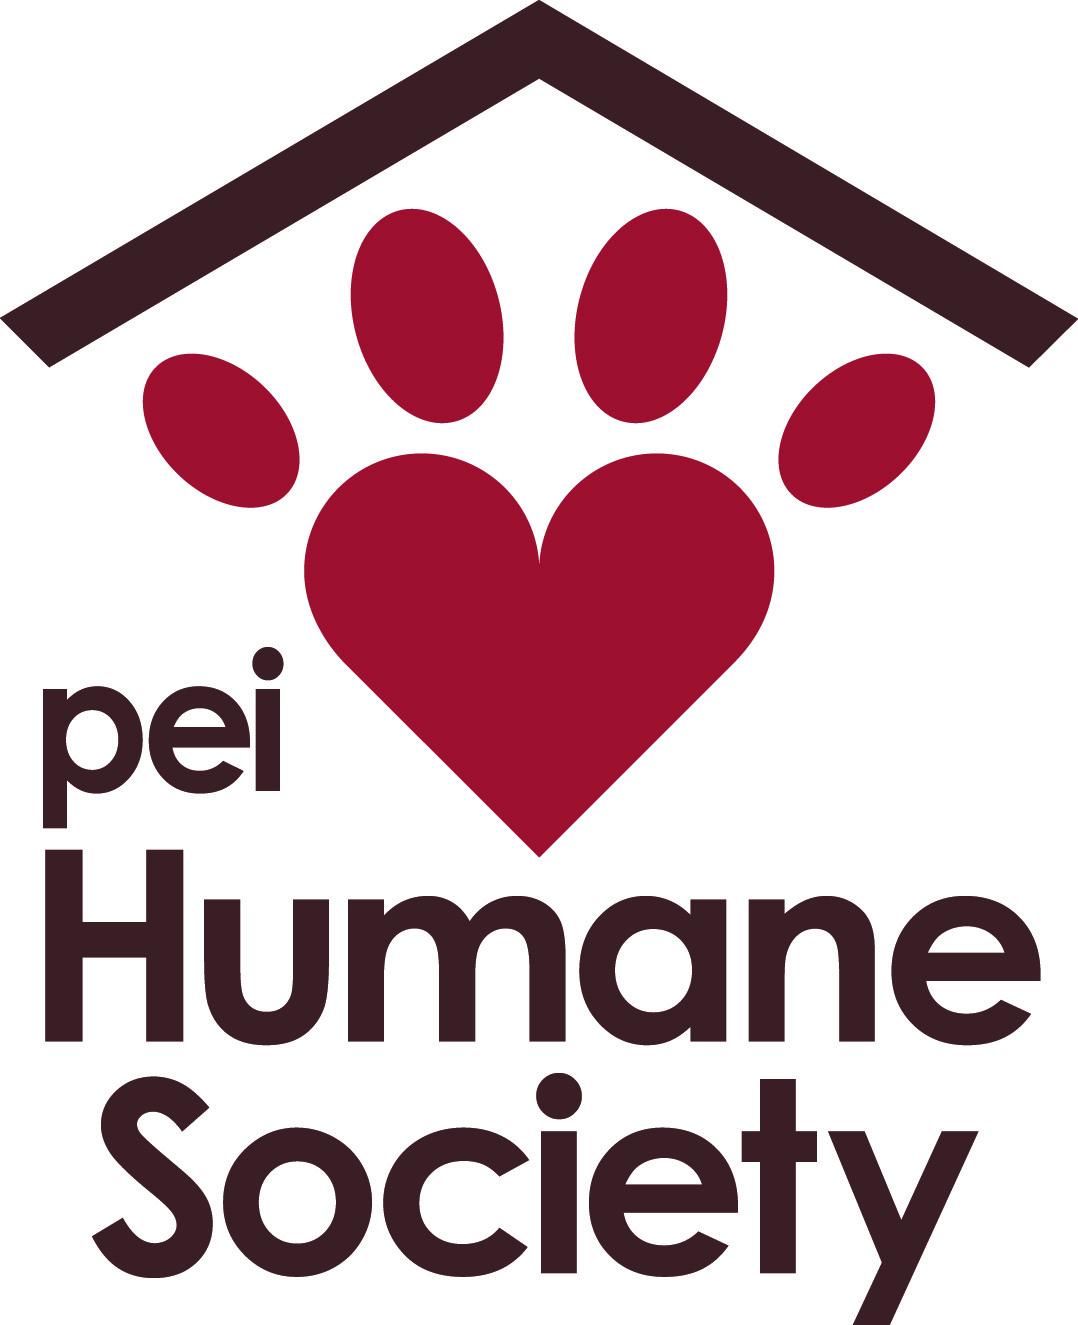 PEIHumaneSociety-Vert-COL-Logo.jpg